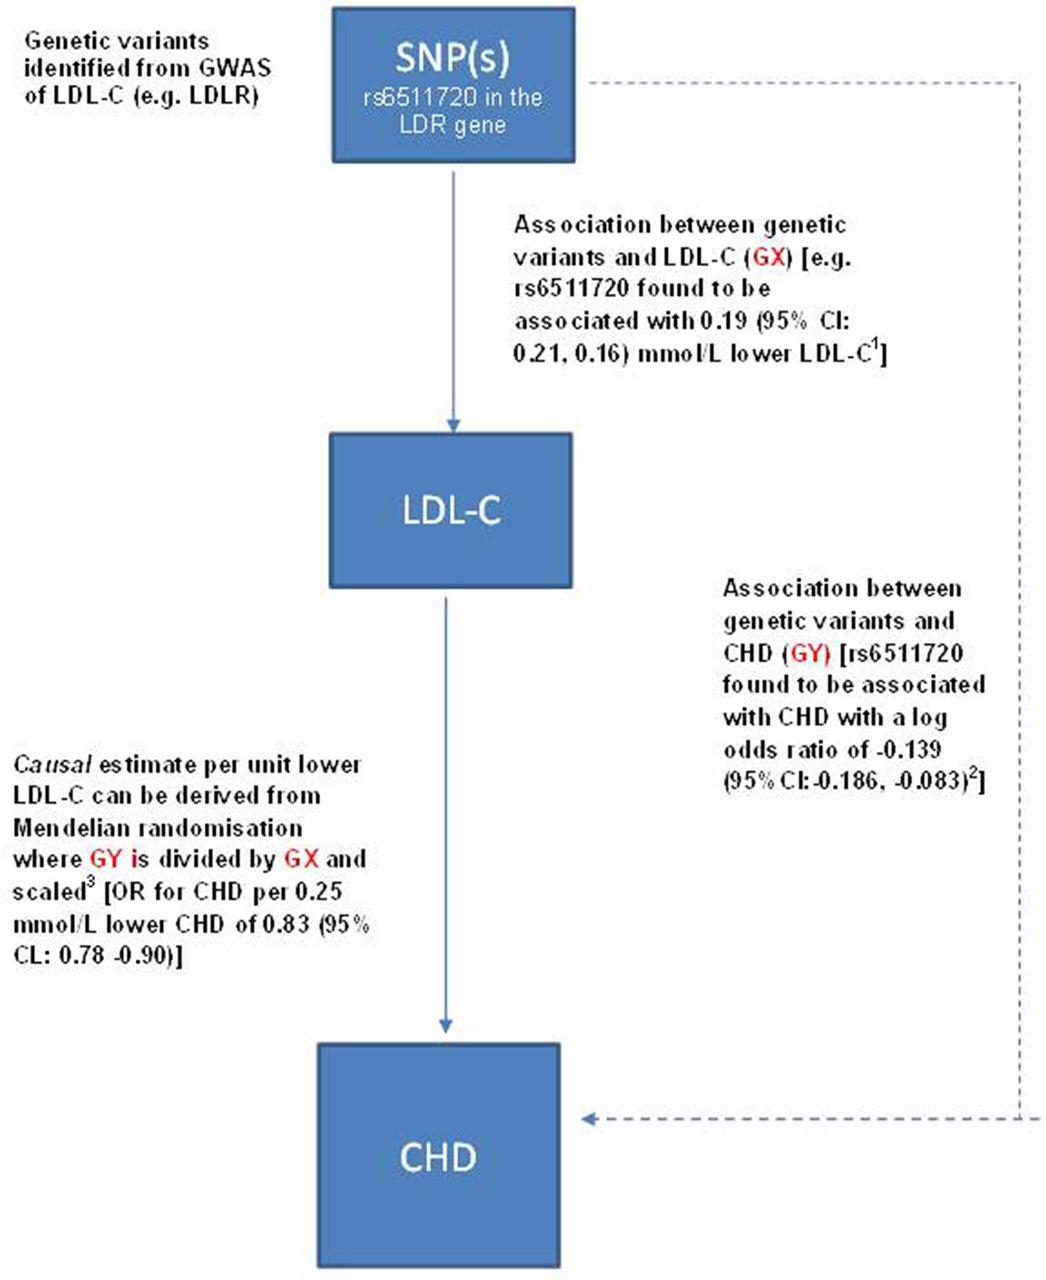 Mendelian randomisation in cardiovascular research: an introduction for clinicians | Heart